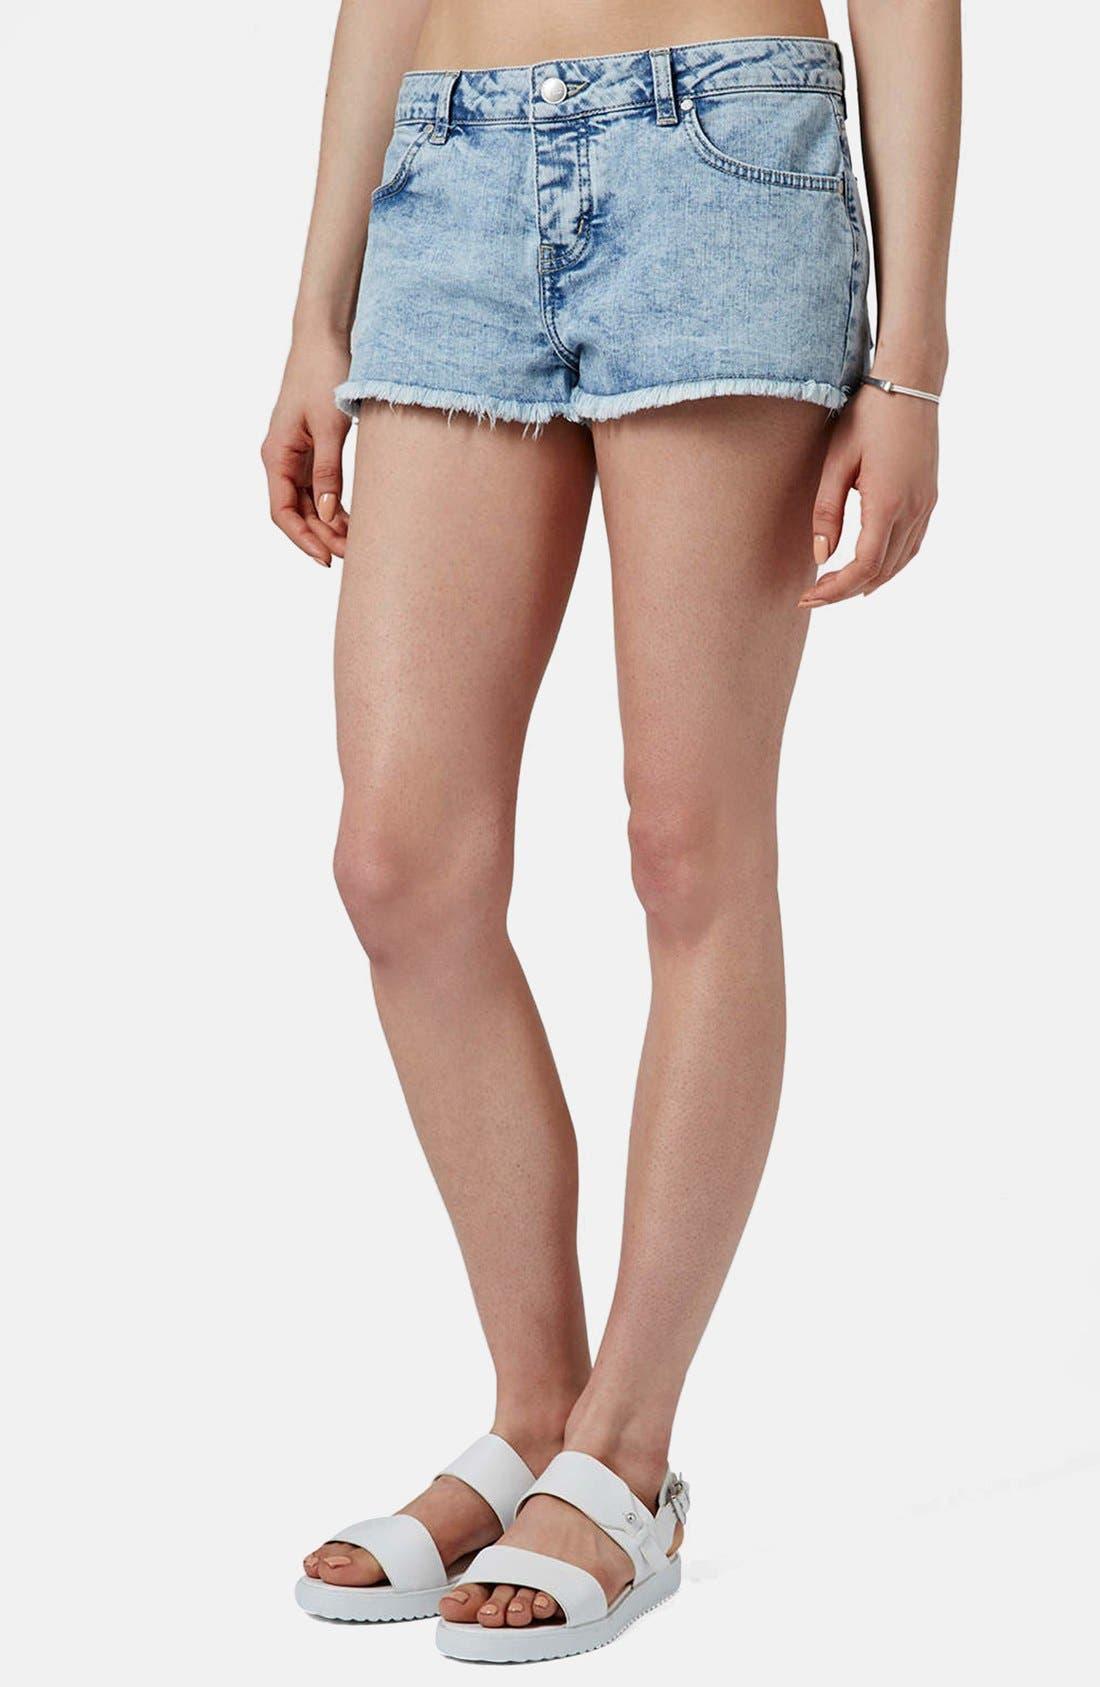 Alternate Image 1 Selected - Topshop Moto 'Daisy' Denim Shorts (Light)